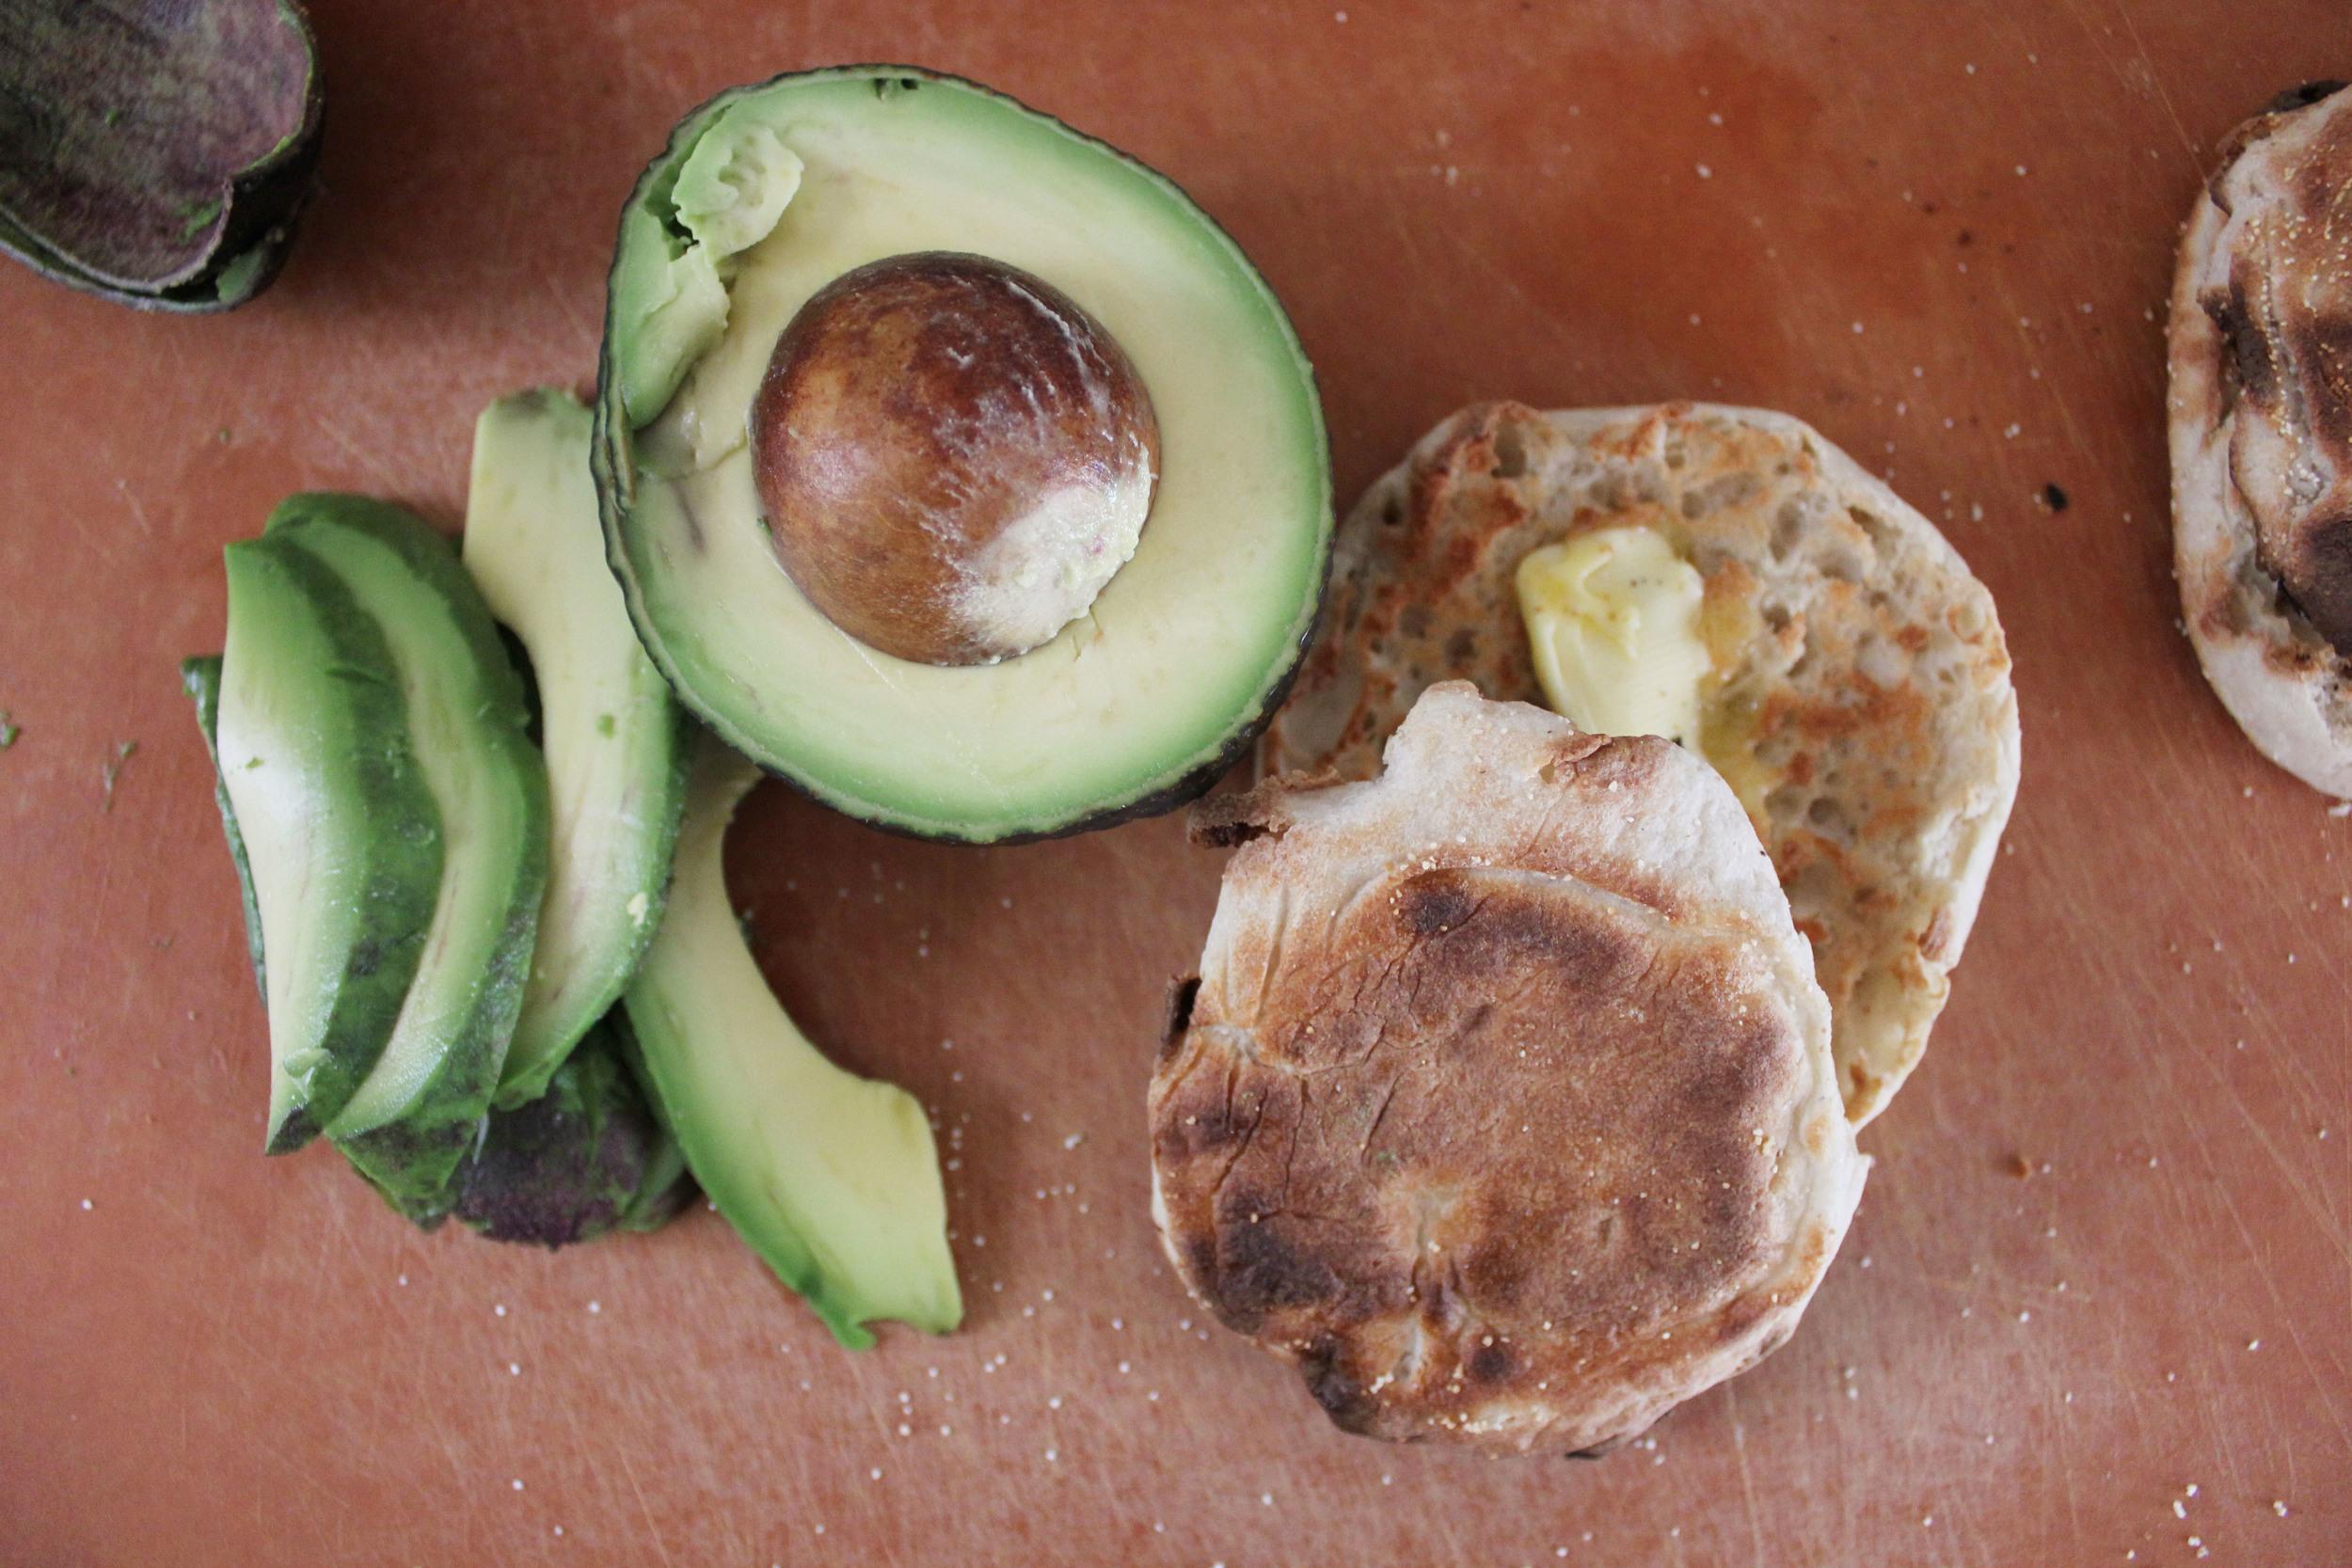 Avocado_and_toast.jpg